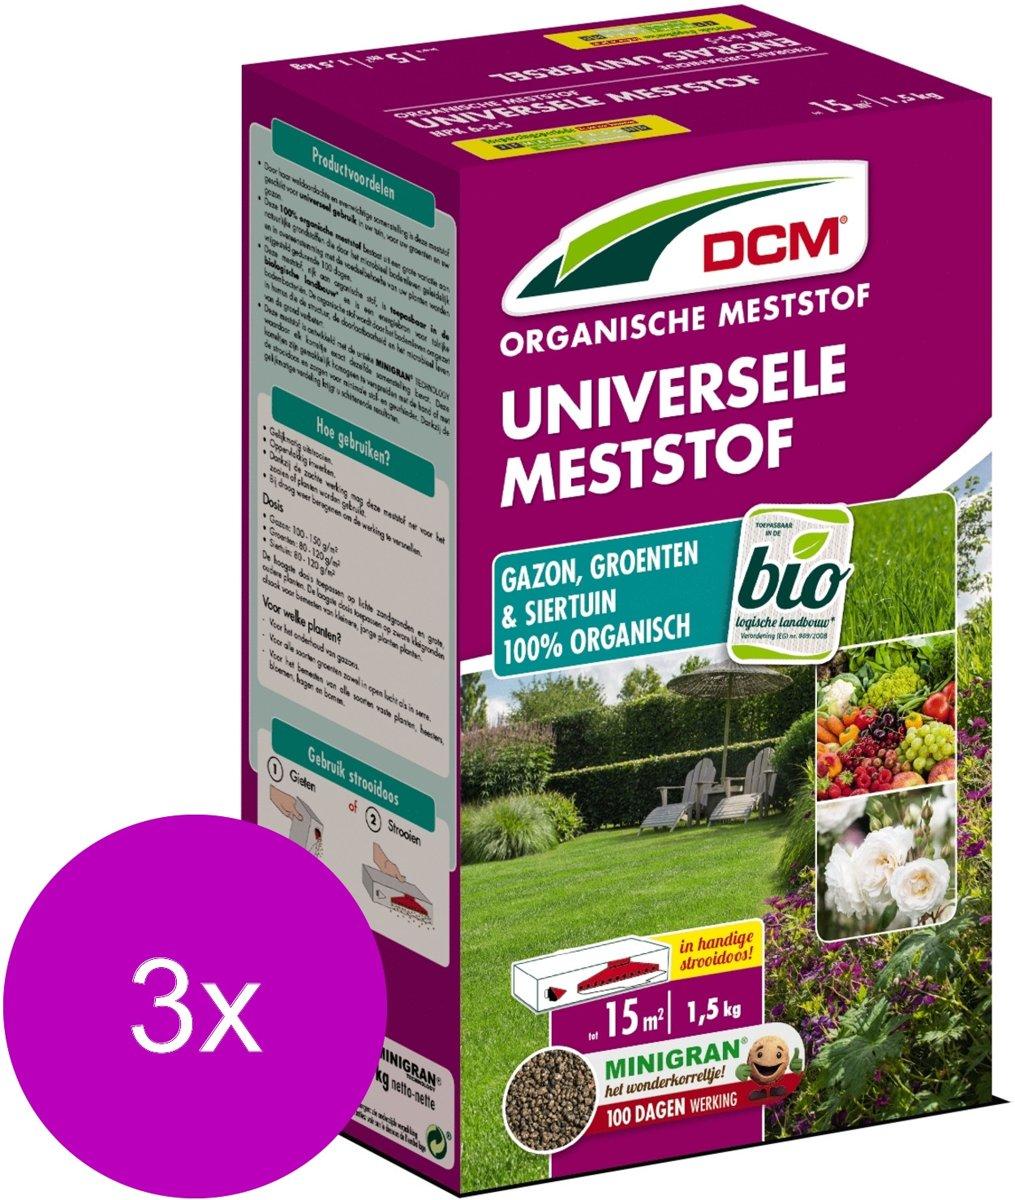 Dcm Meststof Universeel - Siertuinmeststoffen - 3 x 1.5 kg